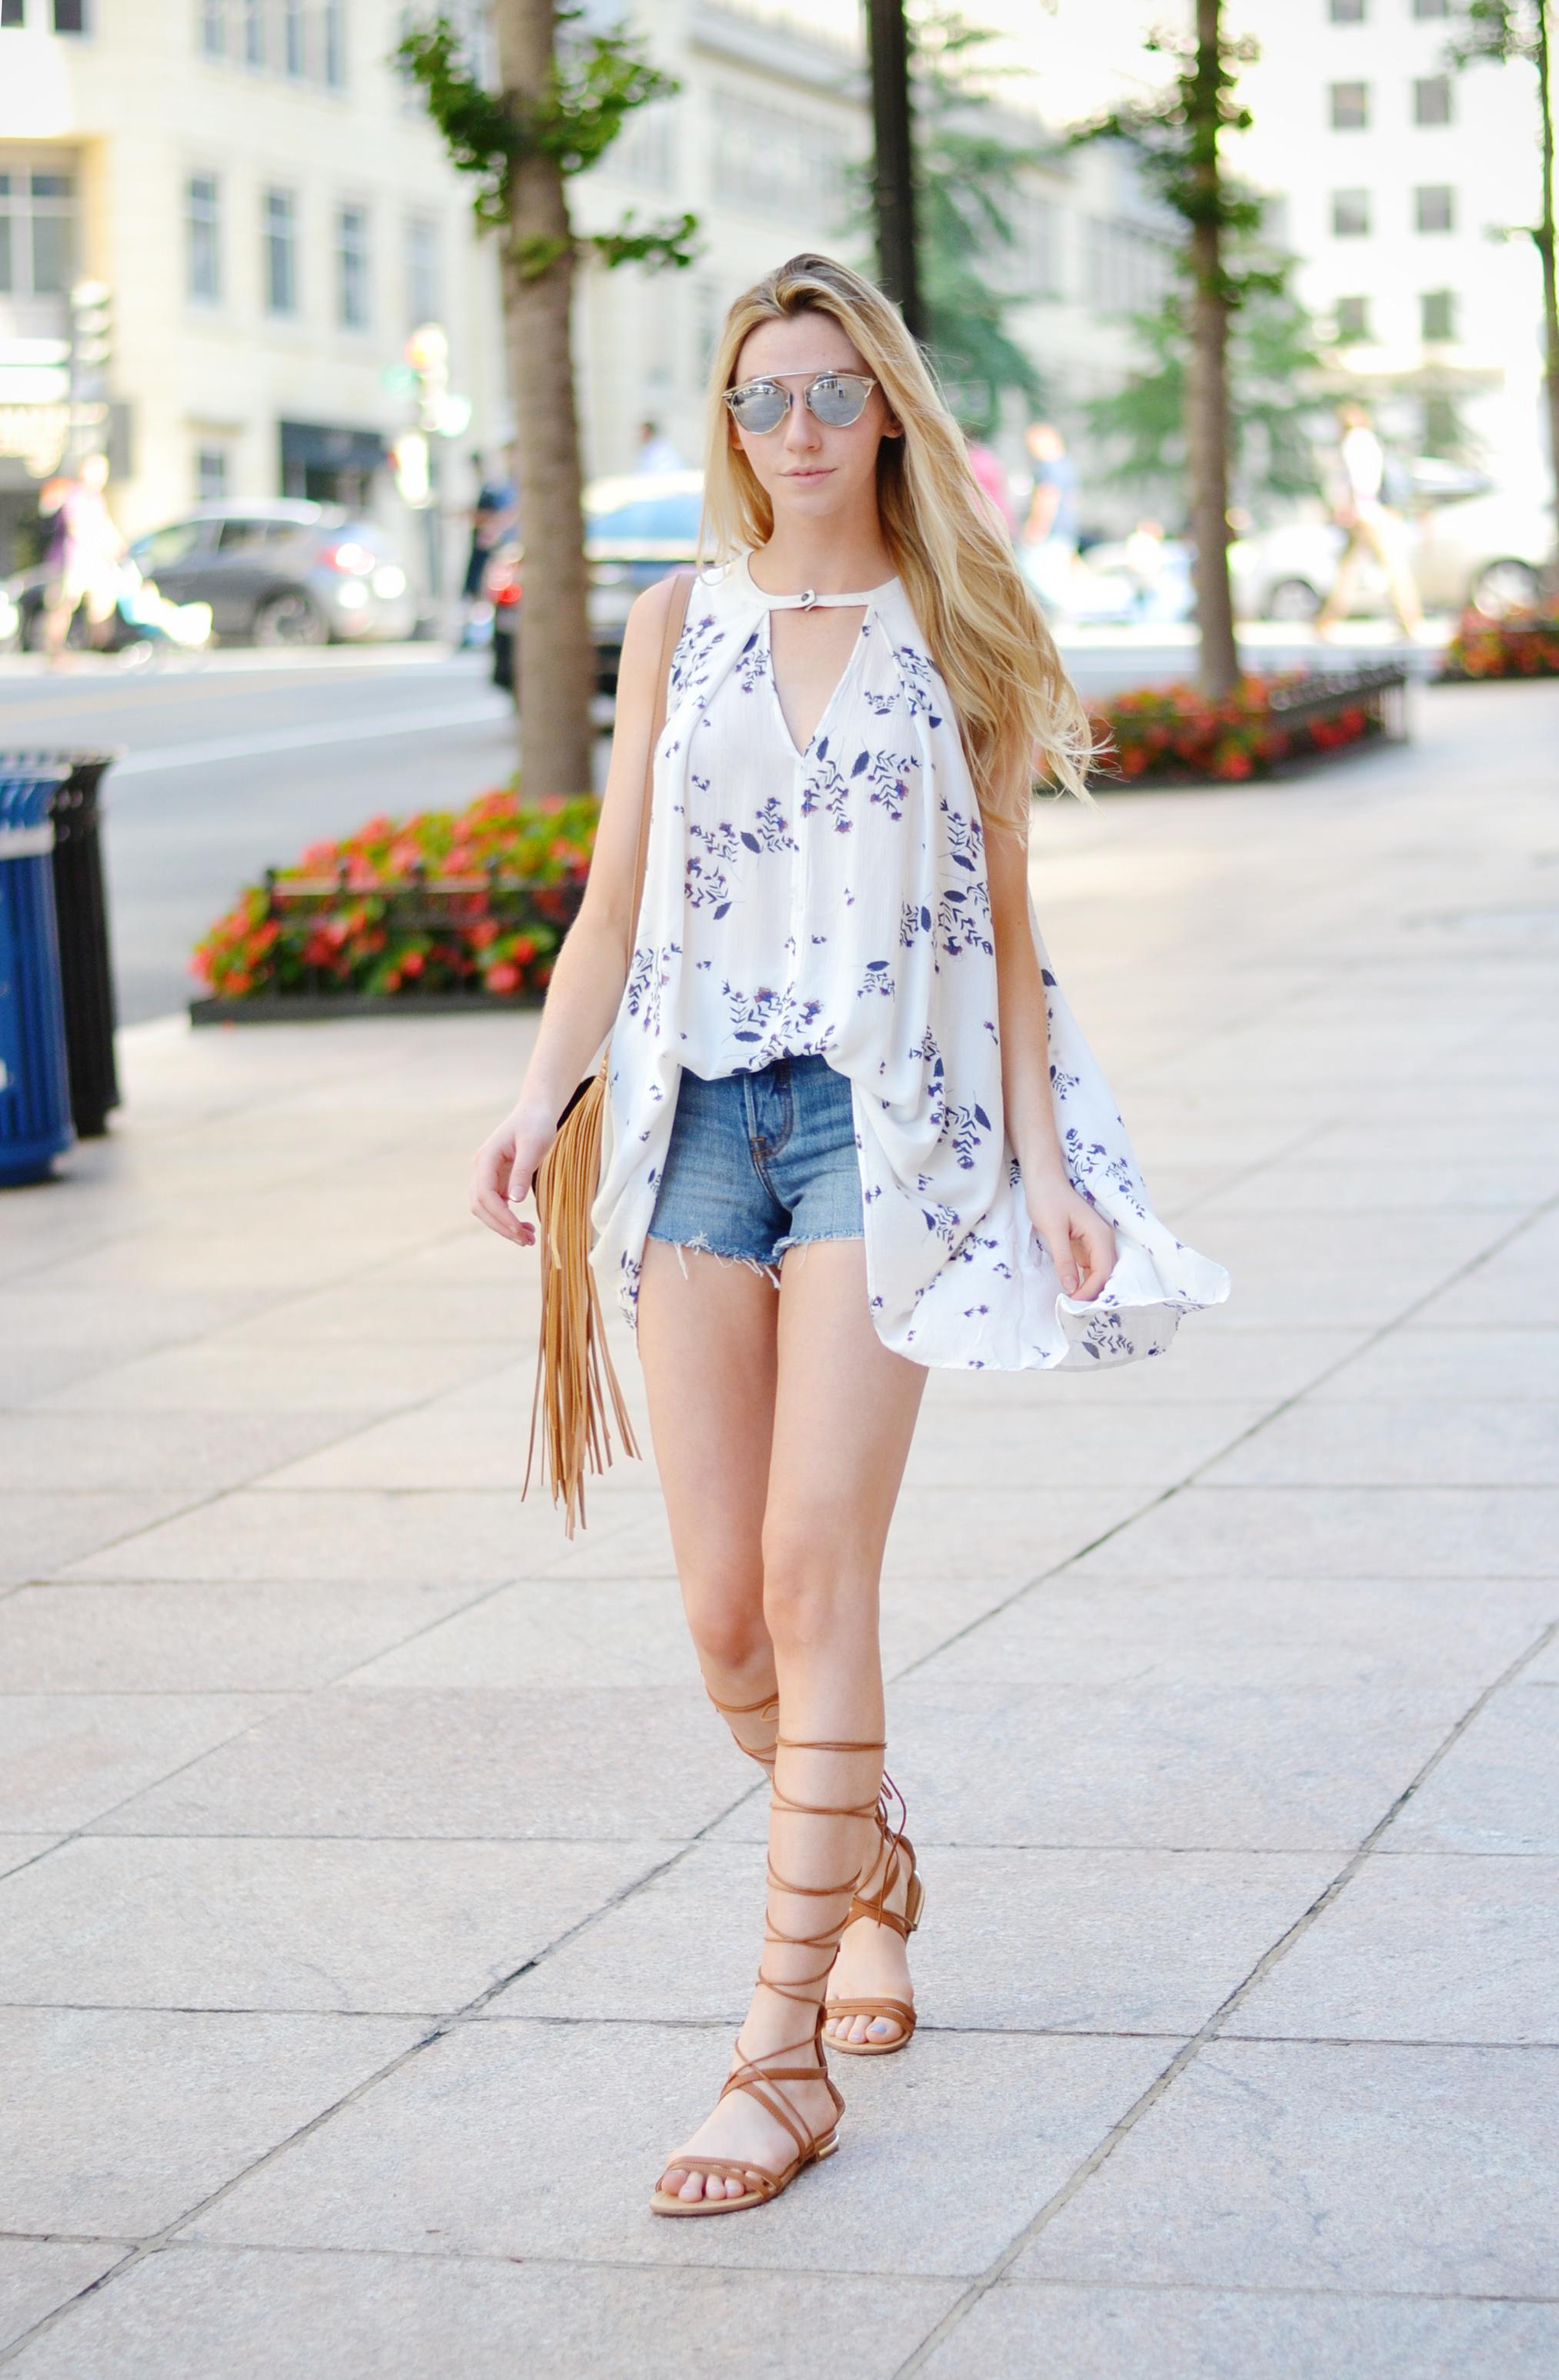 Blogger Flowy Top & Cutoffs (via Chic Now)